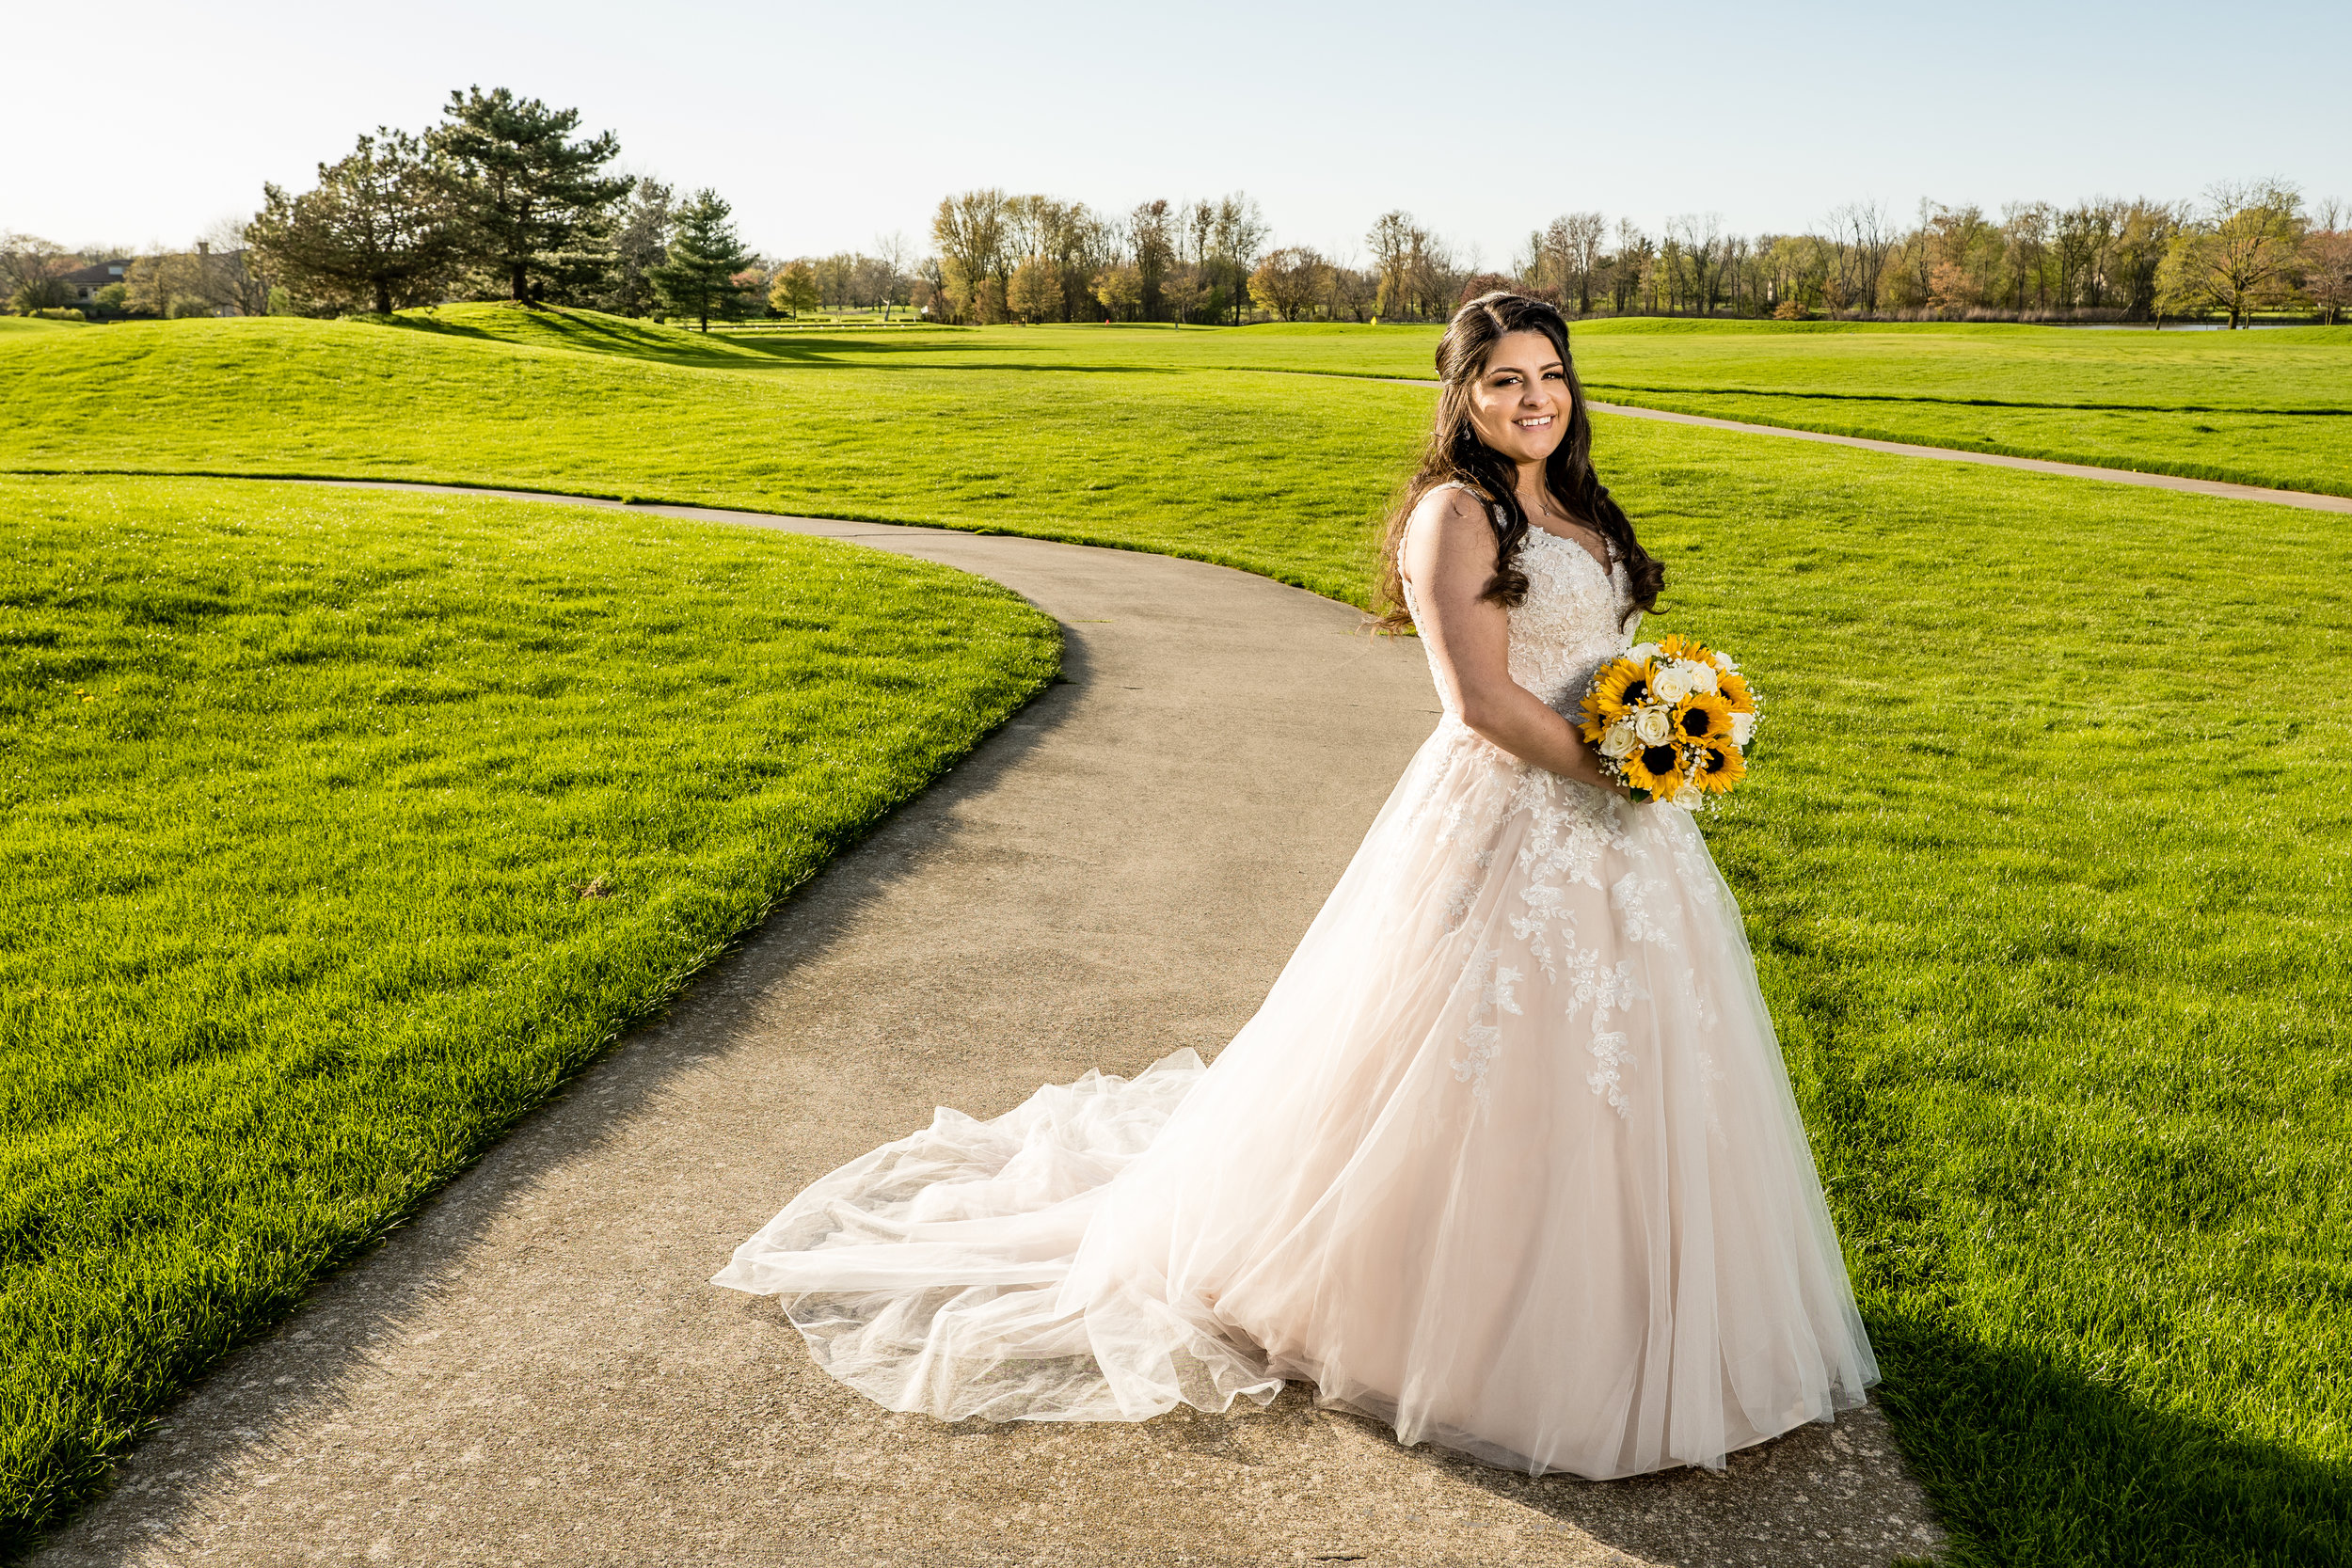 {Photography by: Region Weddings}